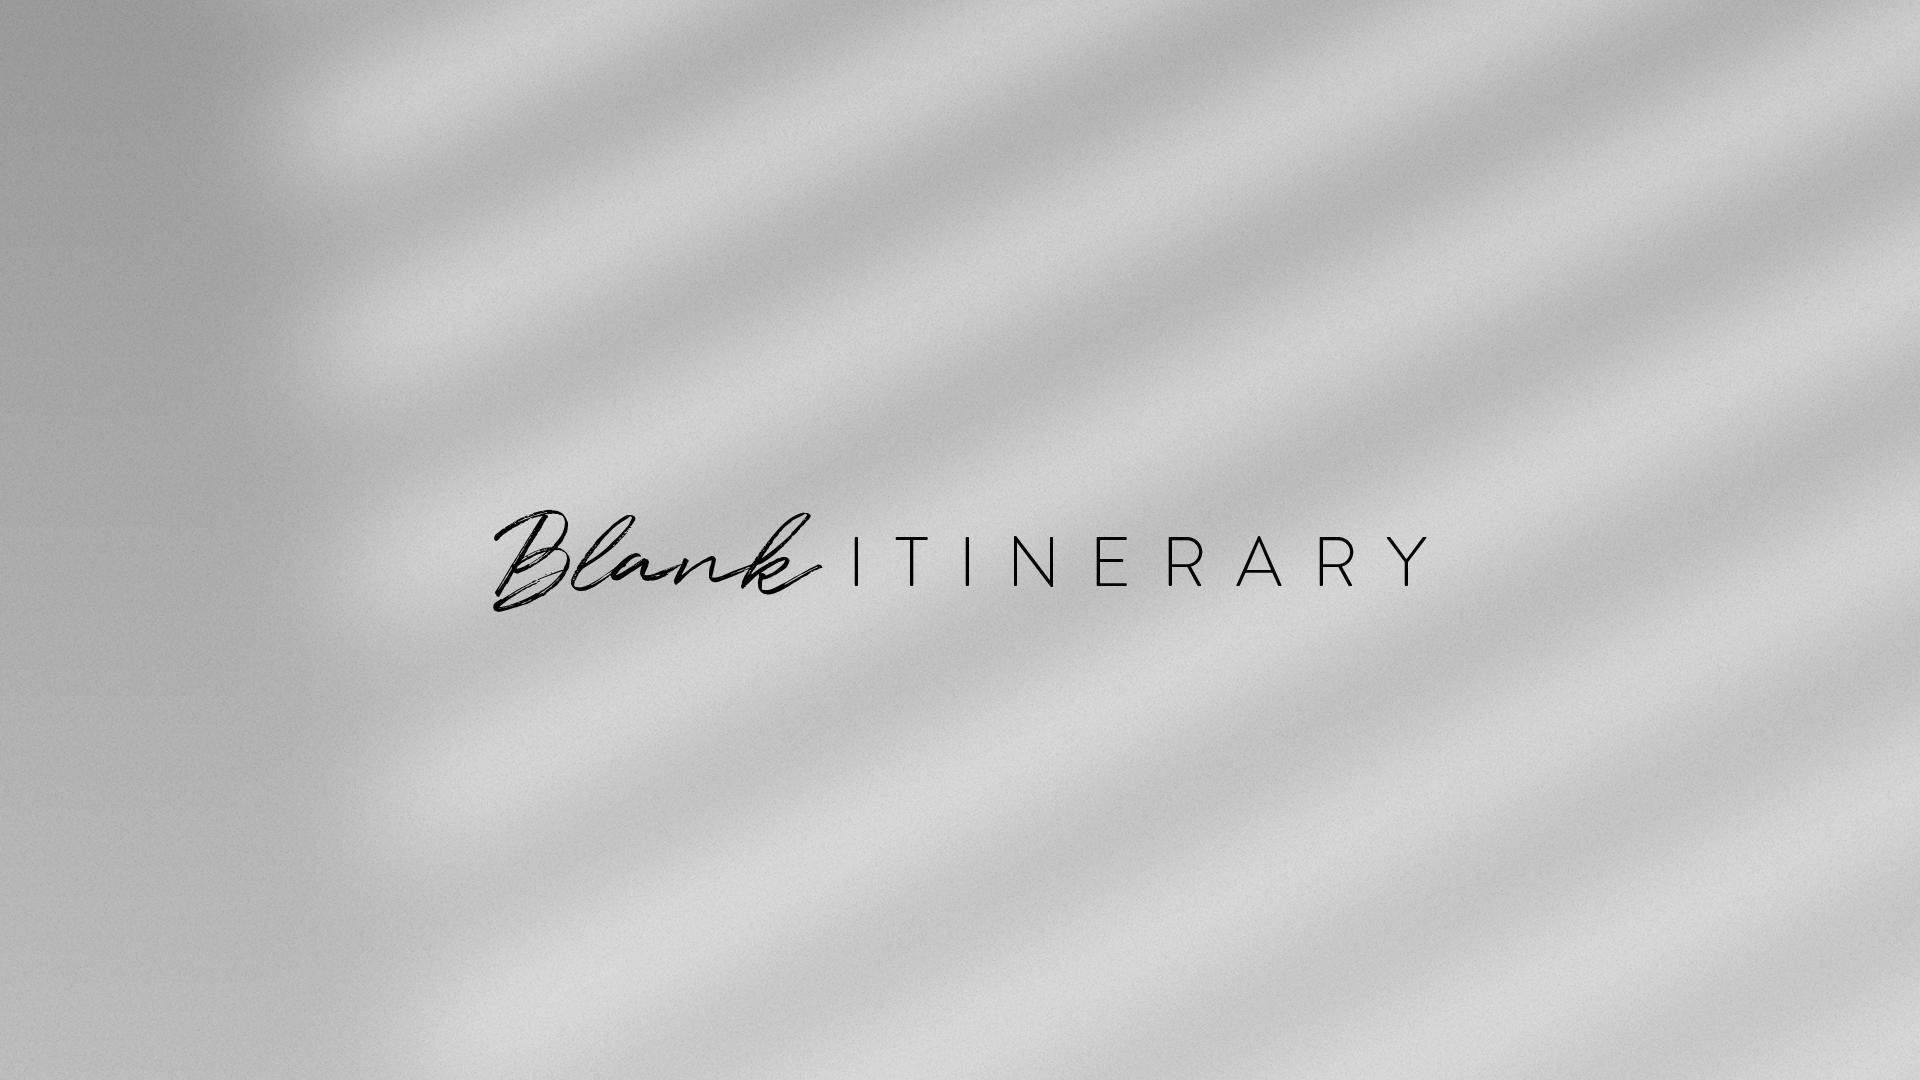 logo-black-blank-itinerary-yoenpaperland